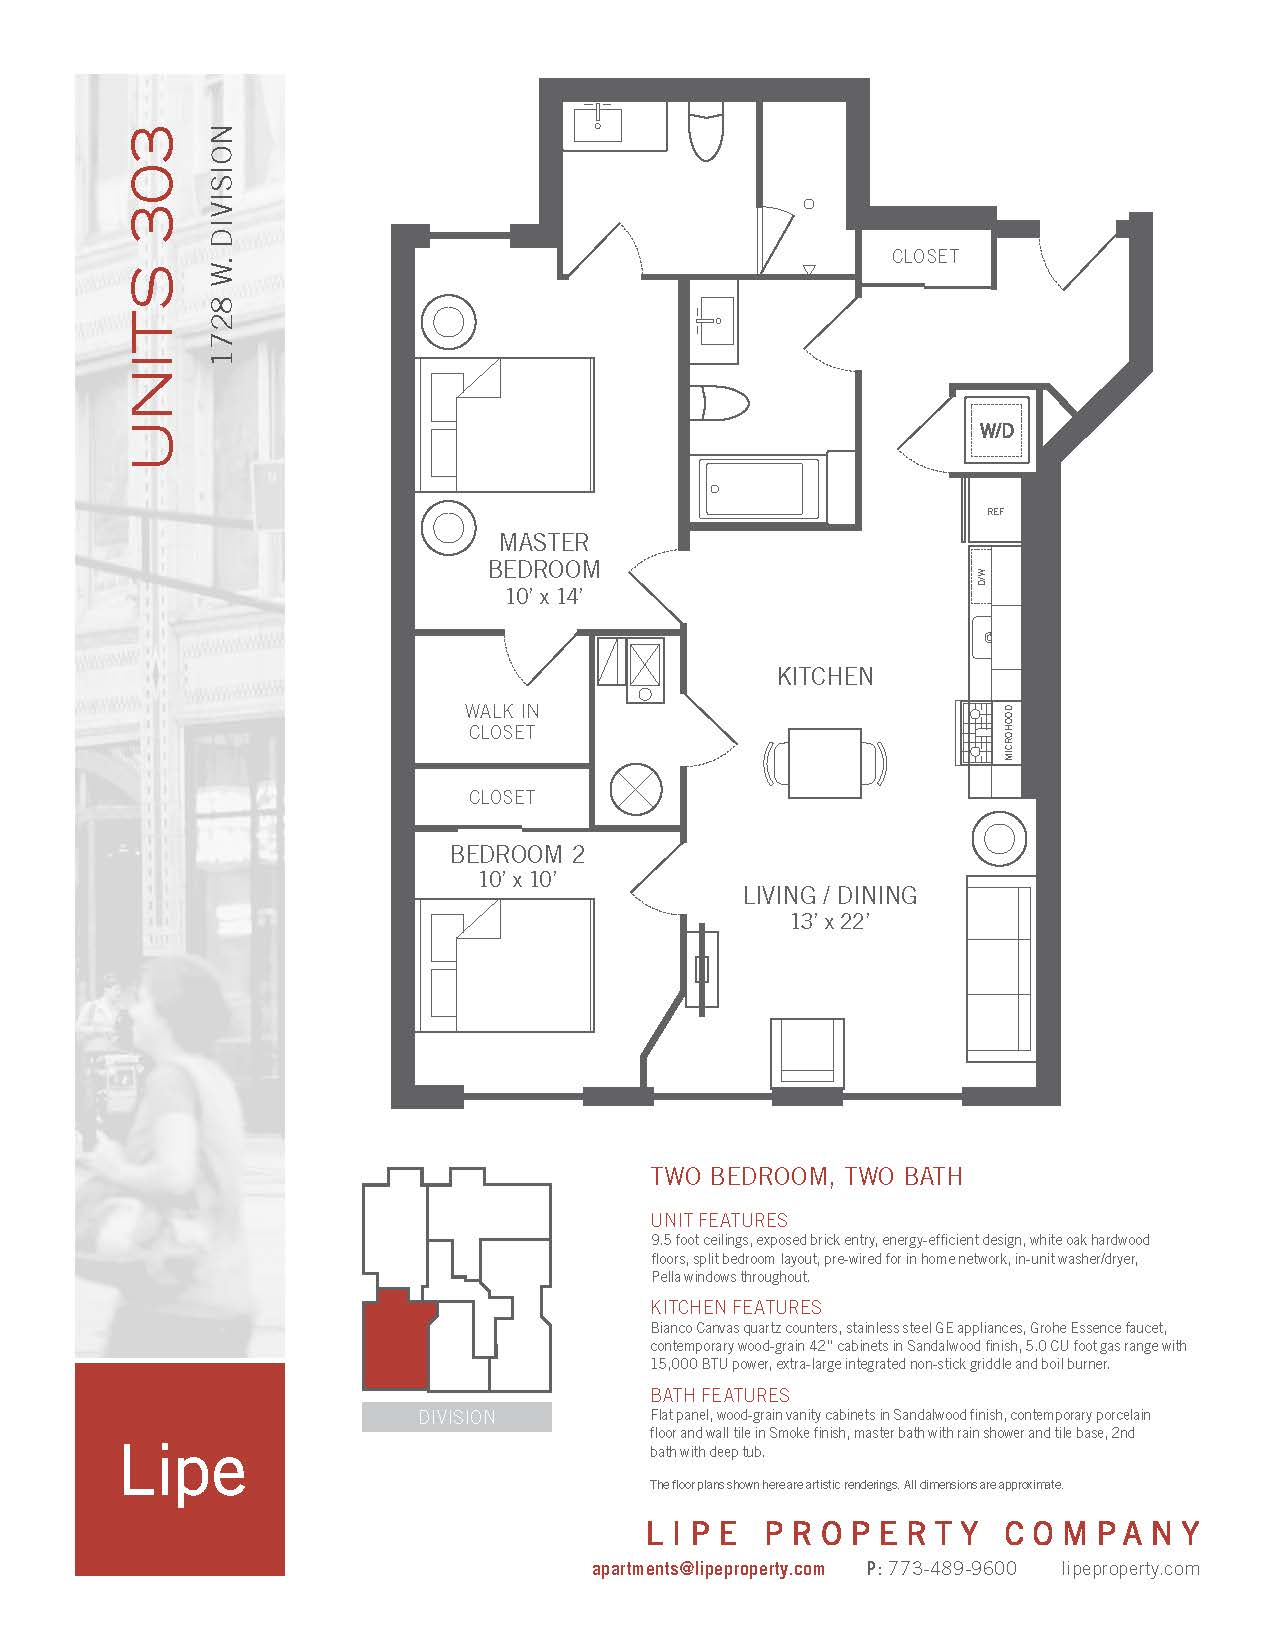 1728-West-Division-303-Floorplan-Chicago-apartment-for-rent.jpg